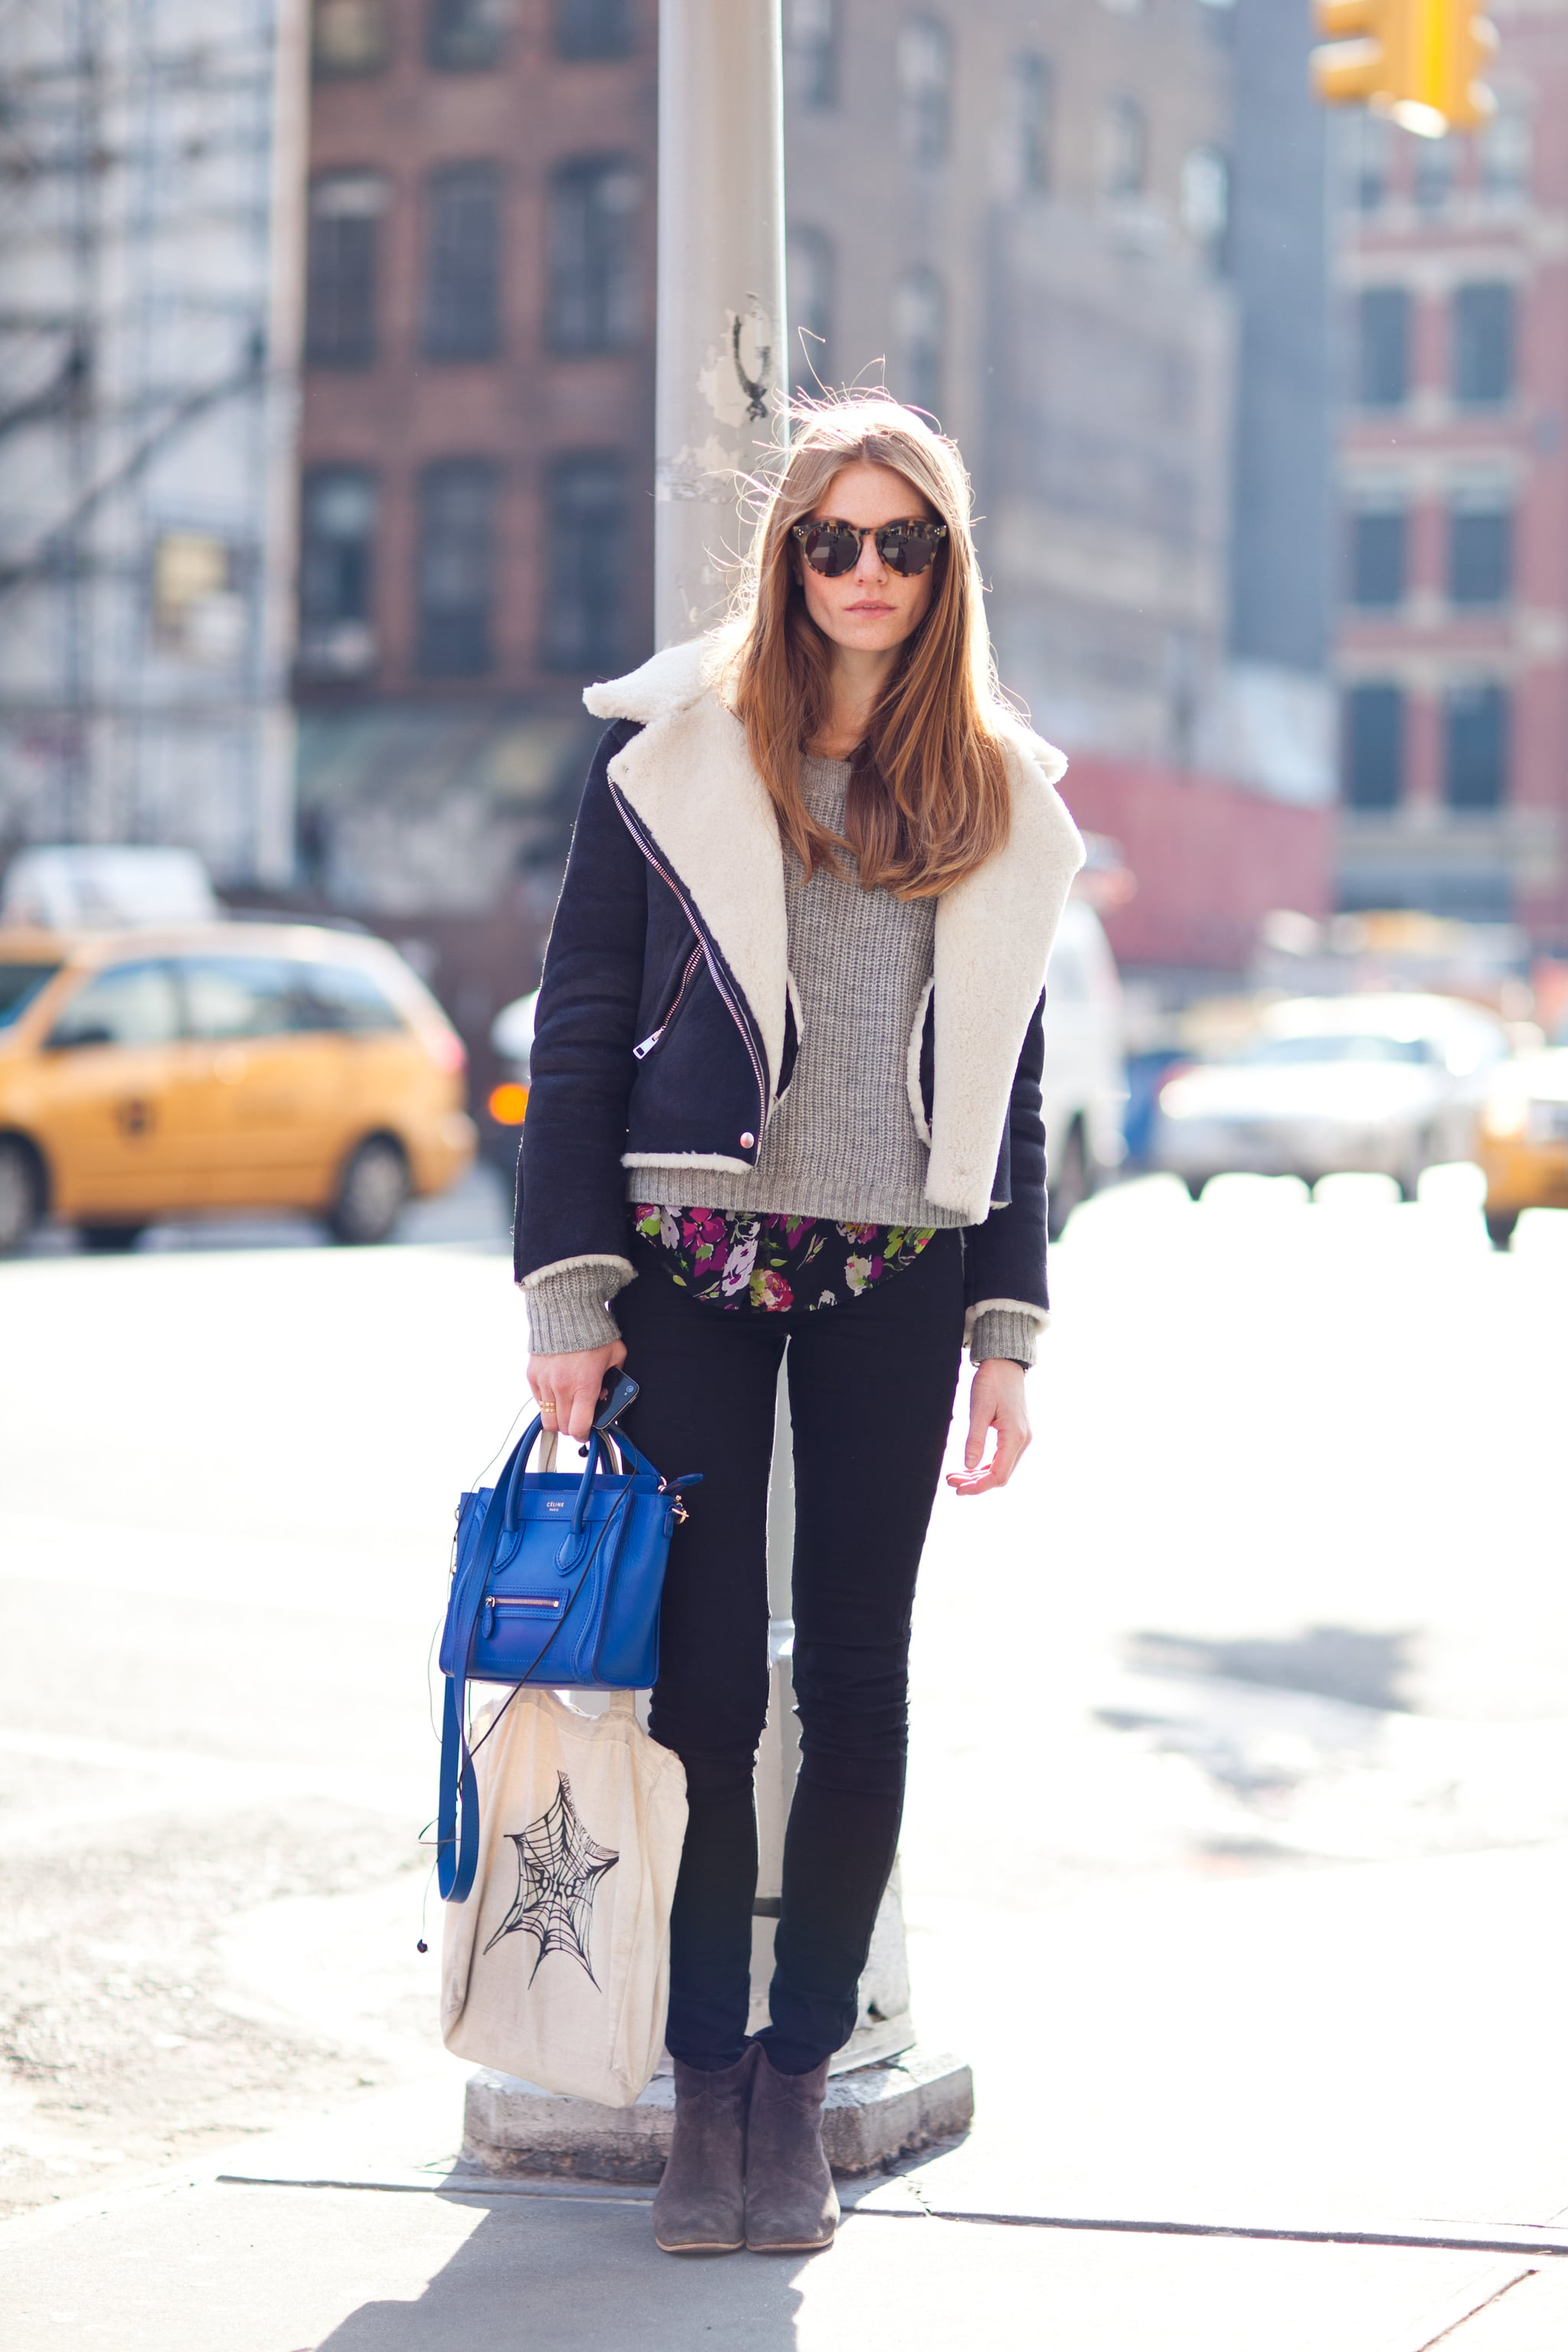 A pop of bright blue gives Winter textures and closet basics a fresh finish. Source: Adam Katz Sinding